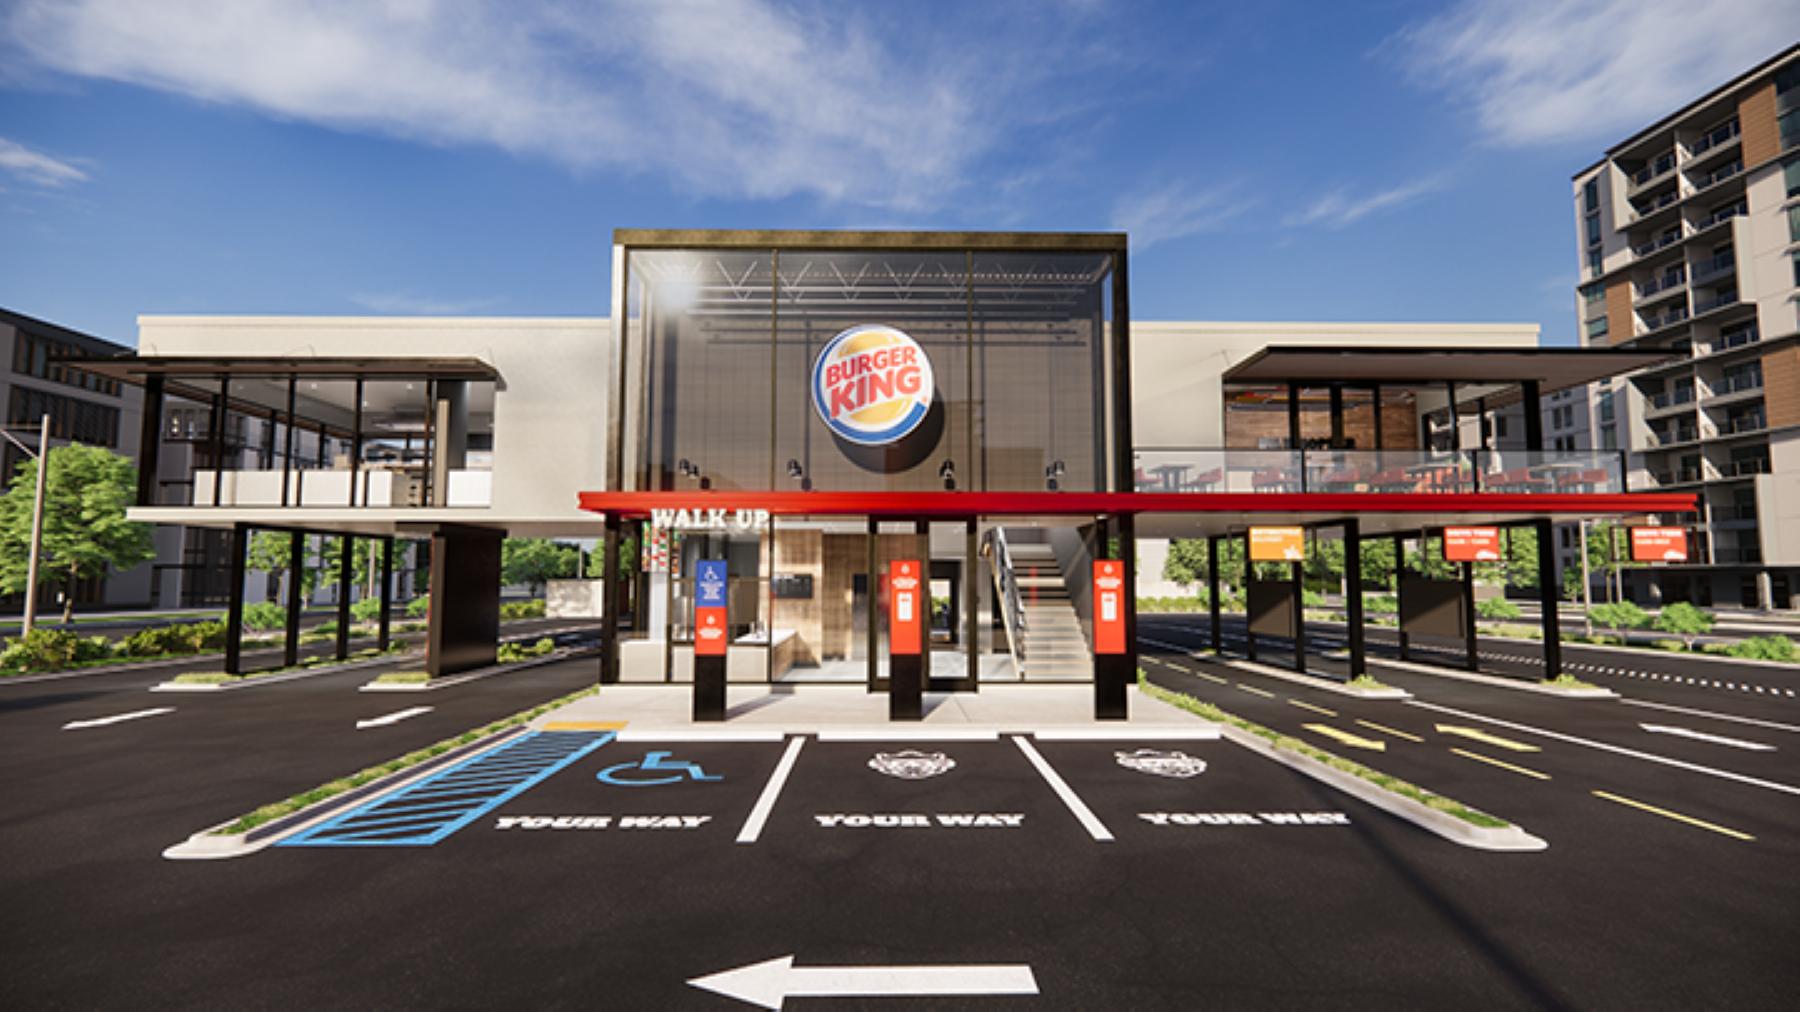 Burger King design